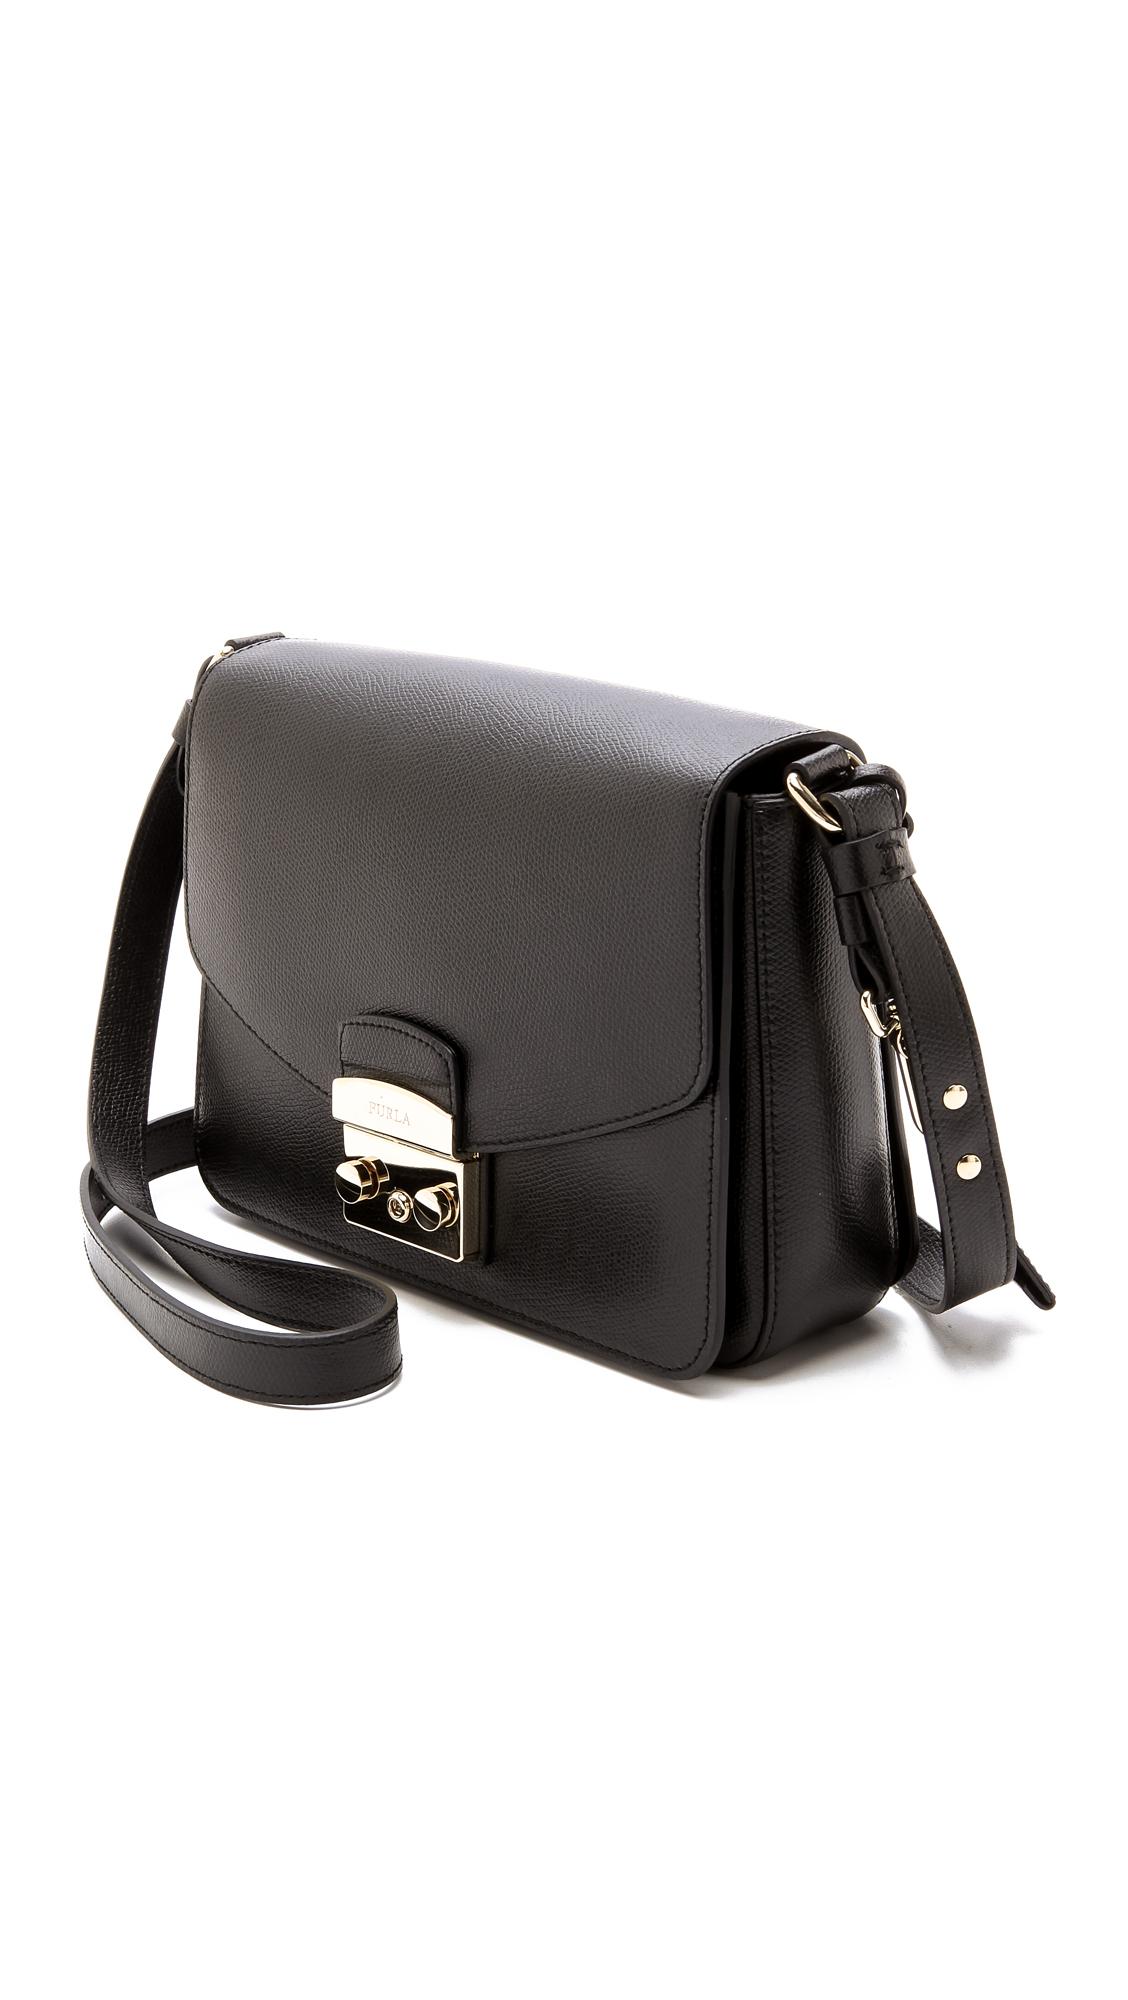 Lyst - Furla Metropolis Shoulder Bag - Onyx in Black c9ffe7d15d0ed